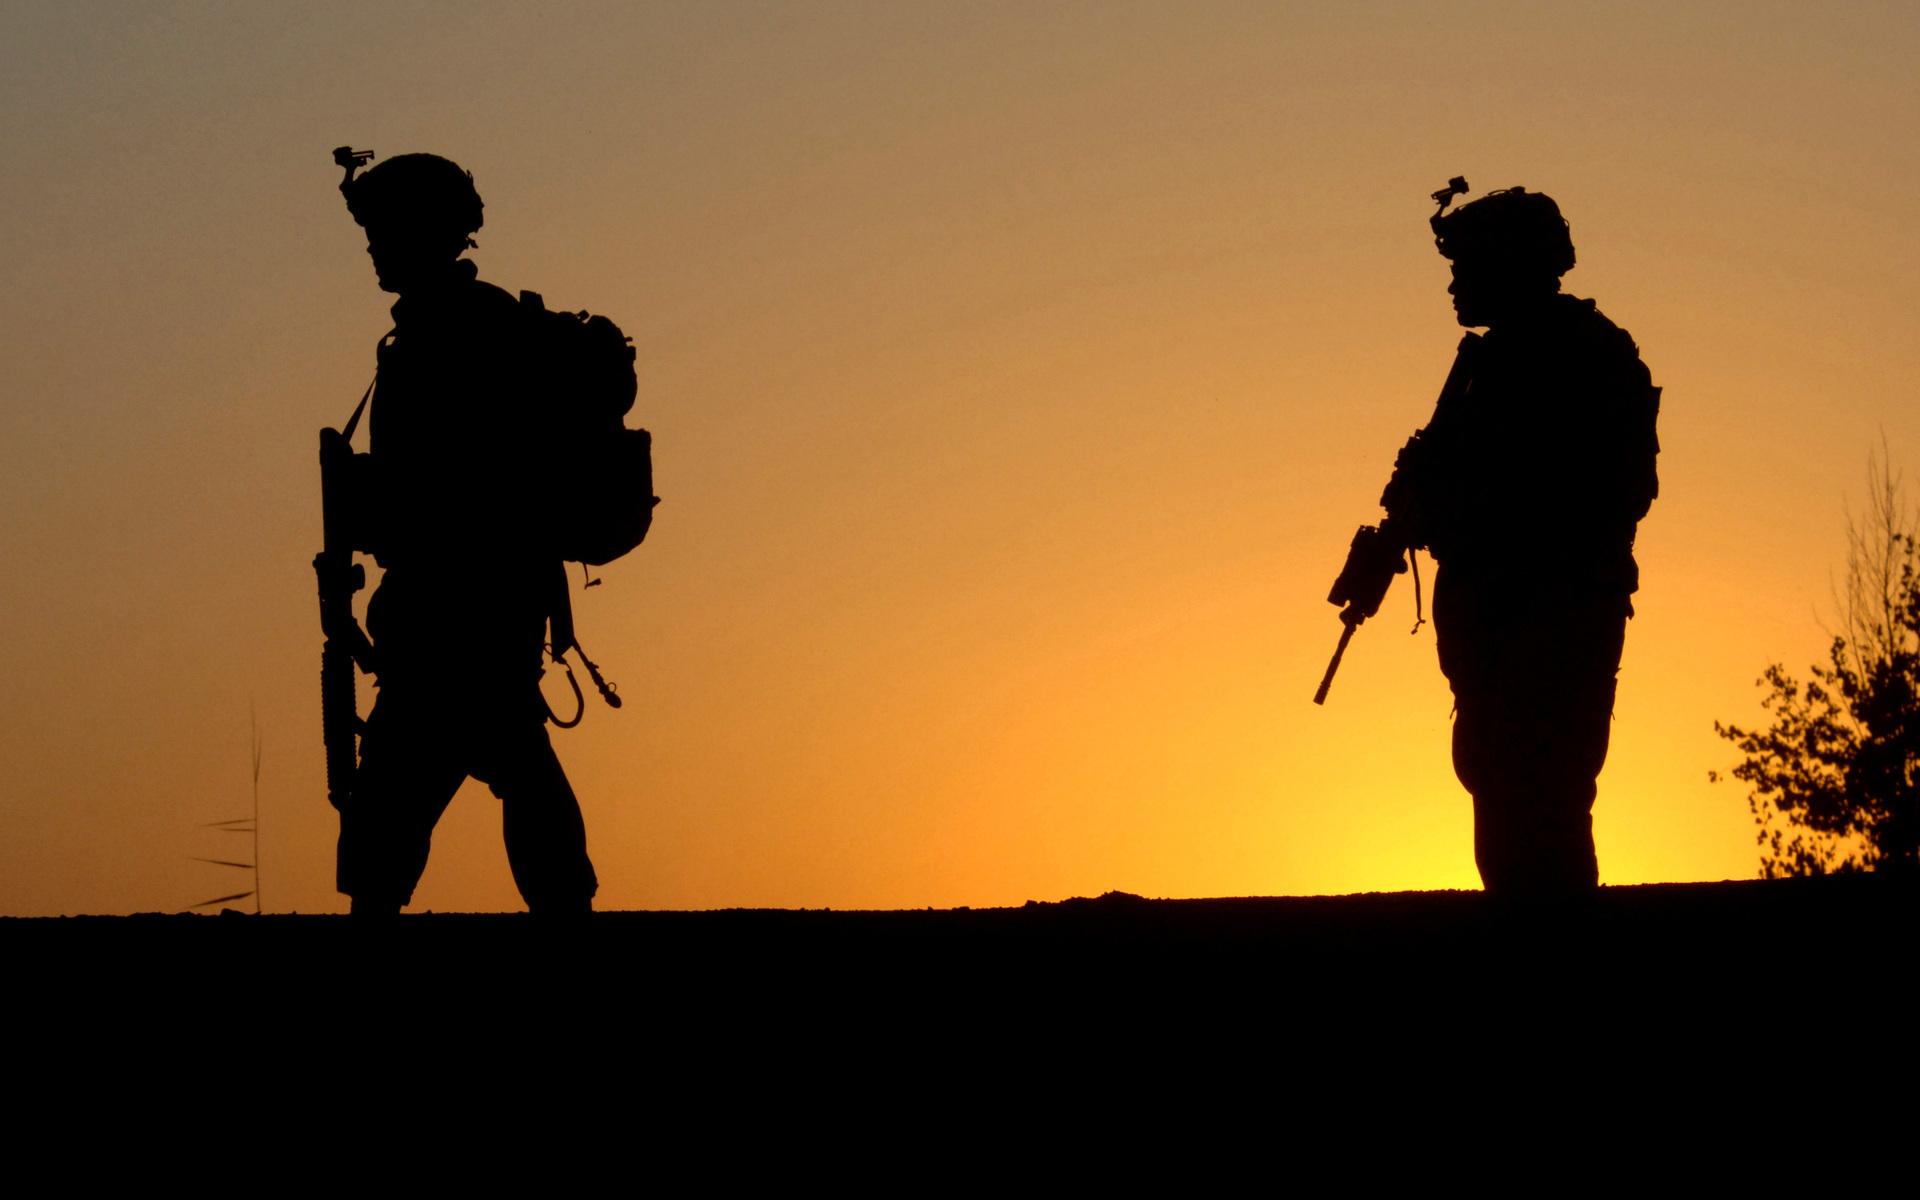 Us Army Wallpaper Hd wallpaper   1116555 1920x1200